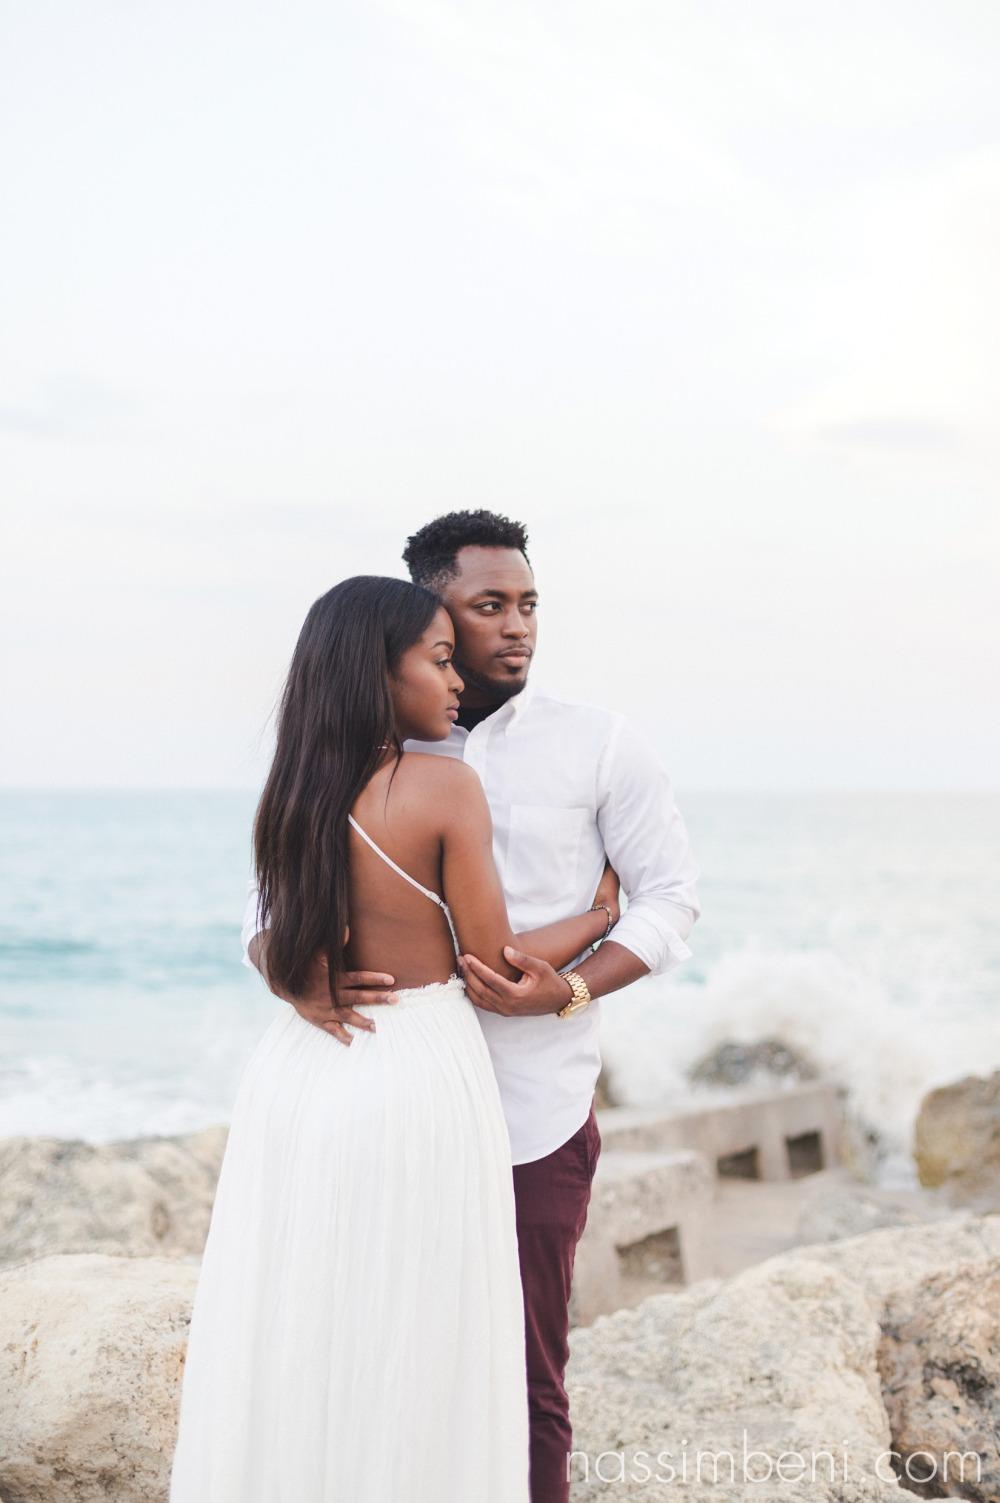 worth avenue engagement photos by port st lucie wedding photographer nassimbeni photography